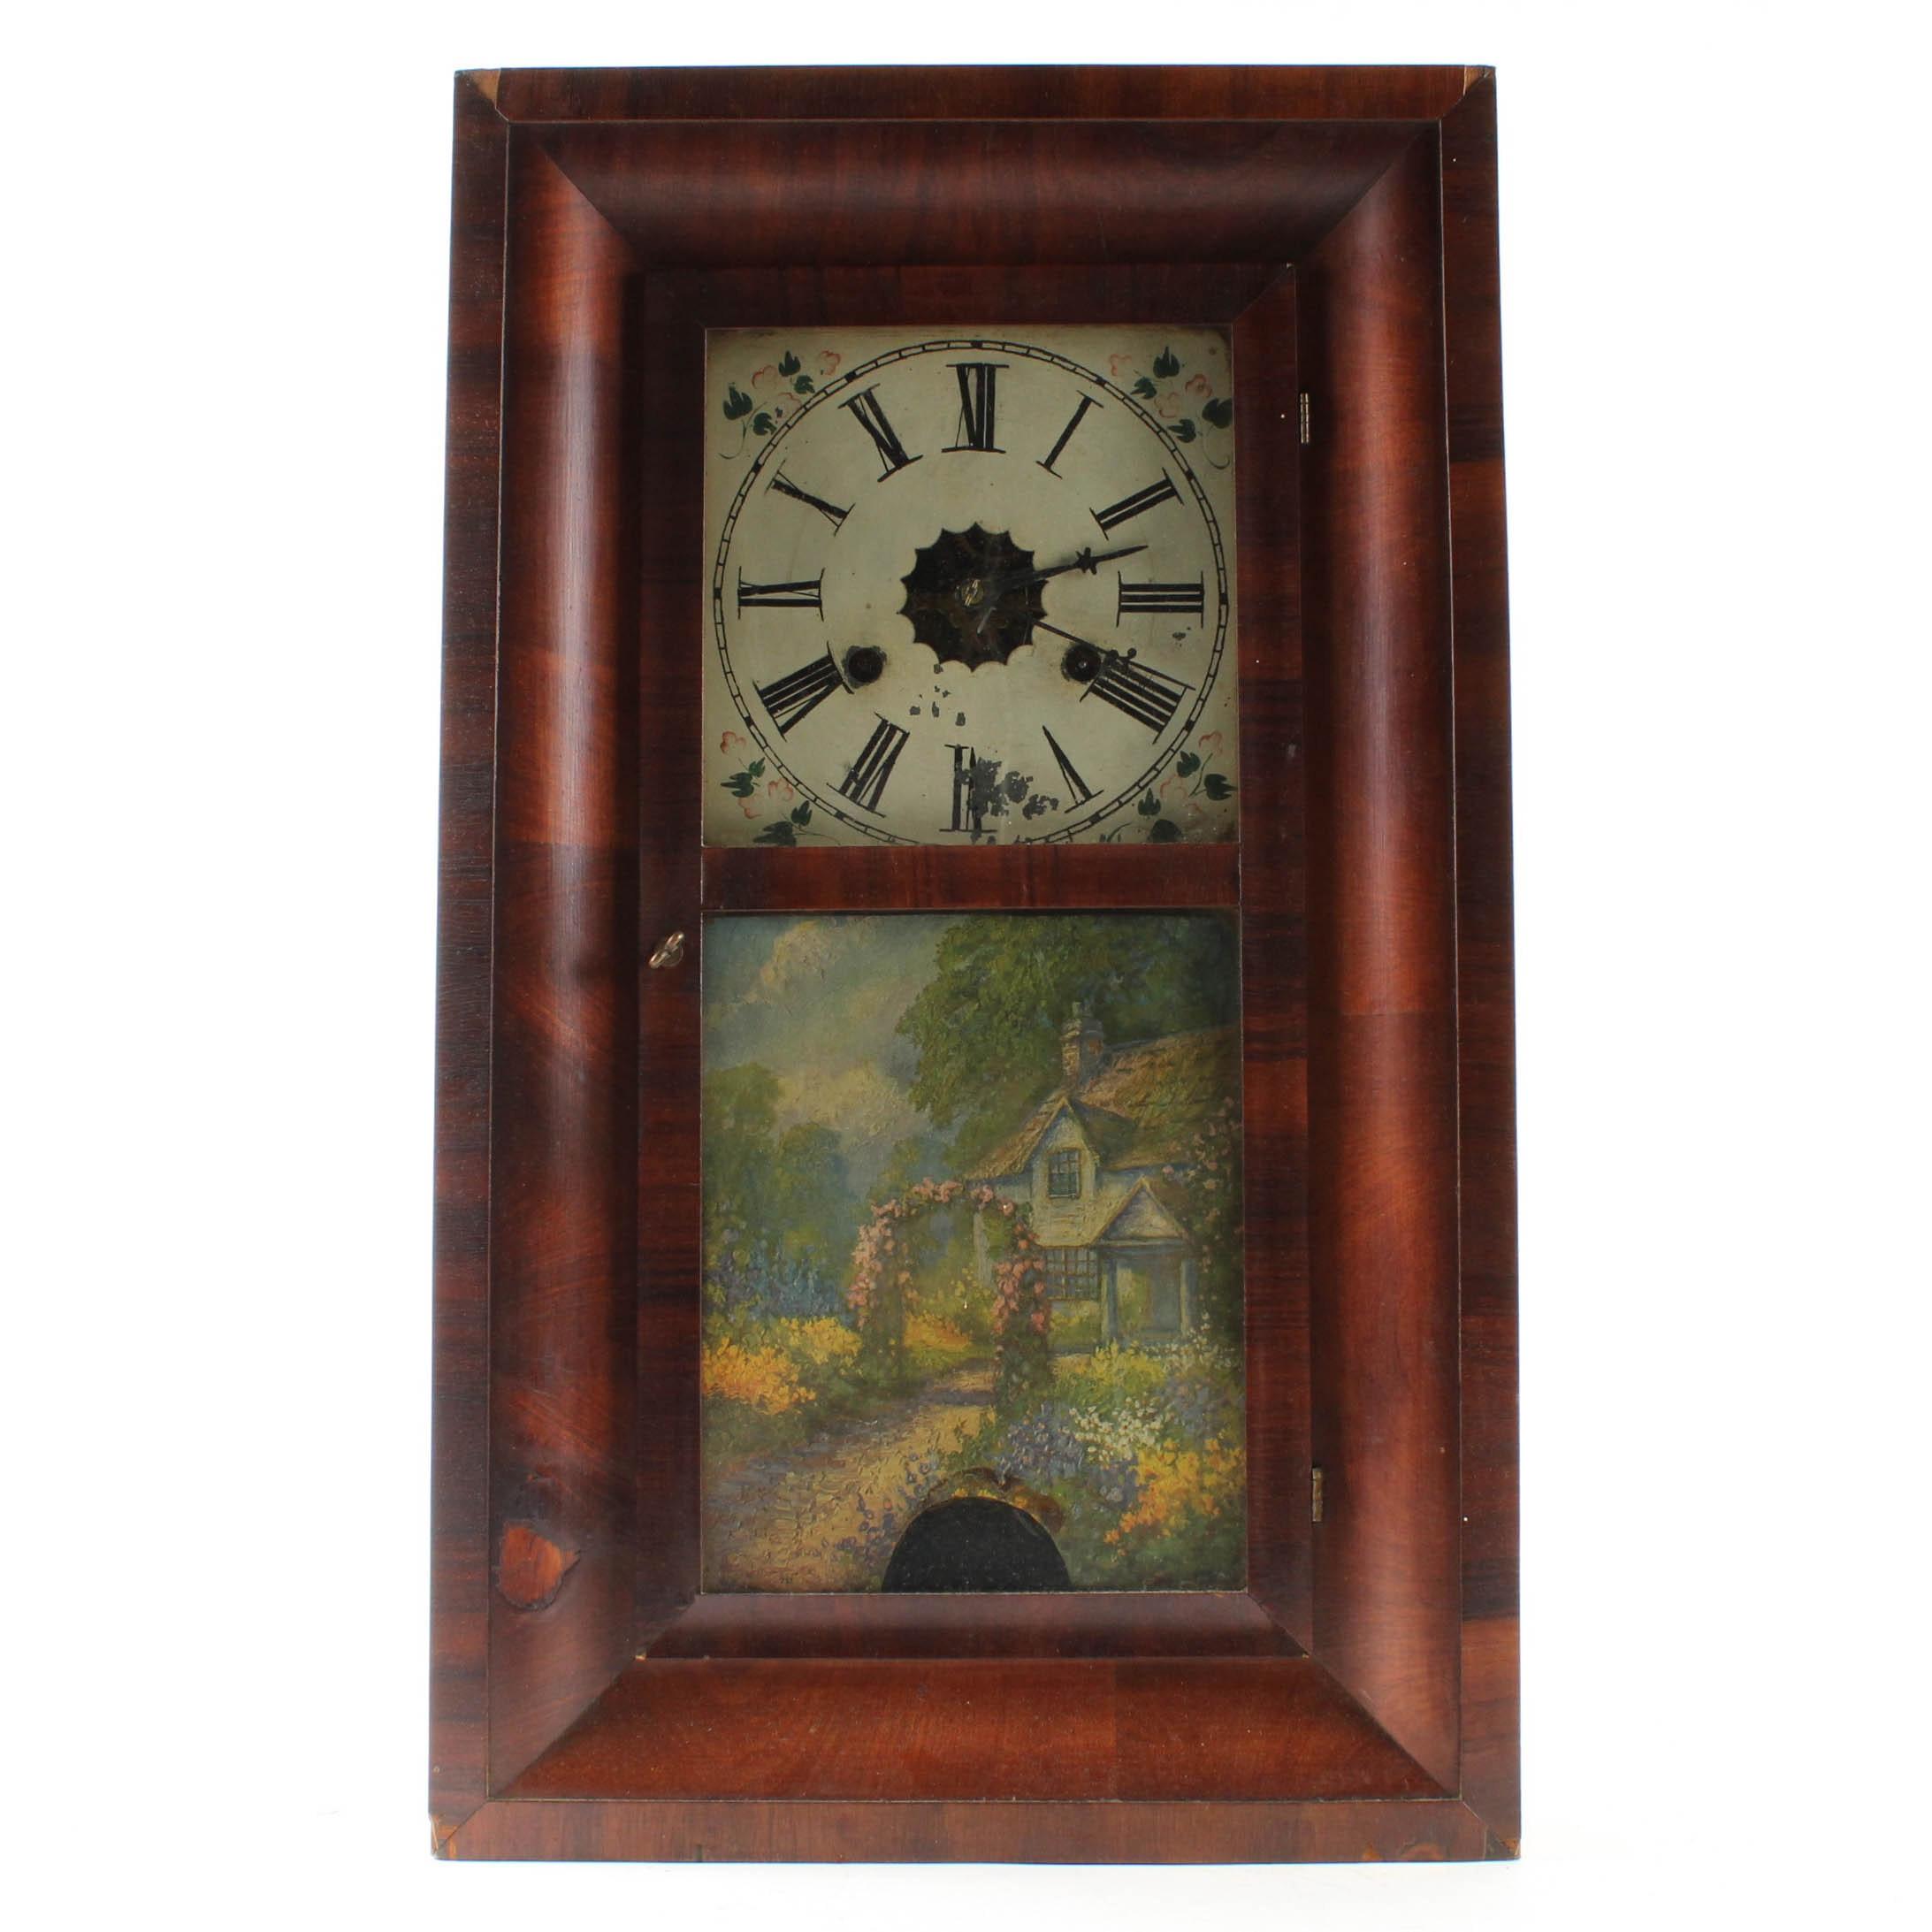 Antique Forestville Mantel Clock